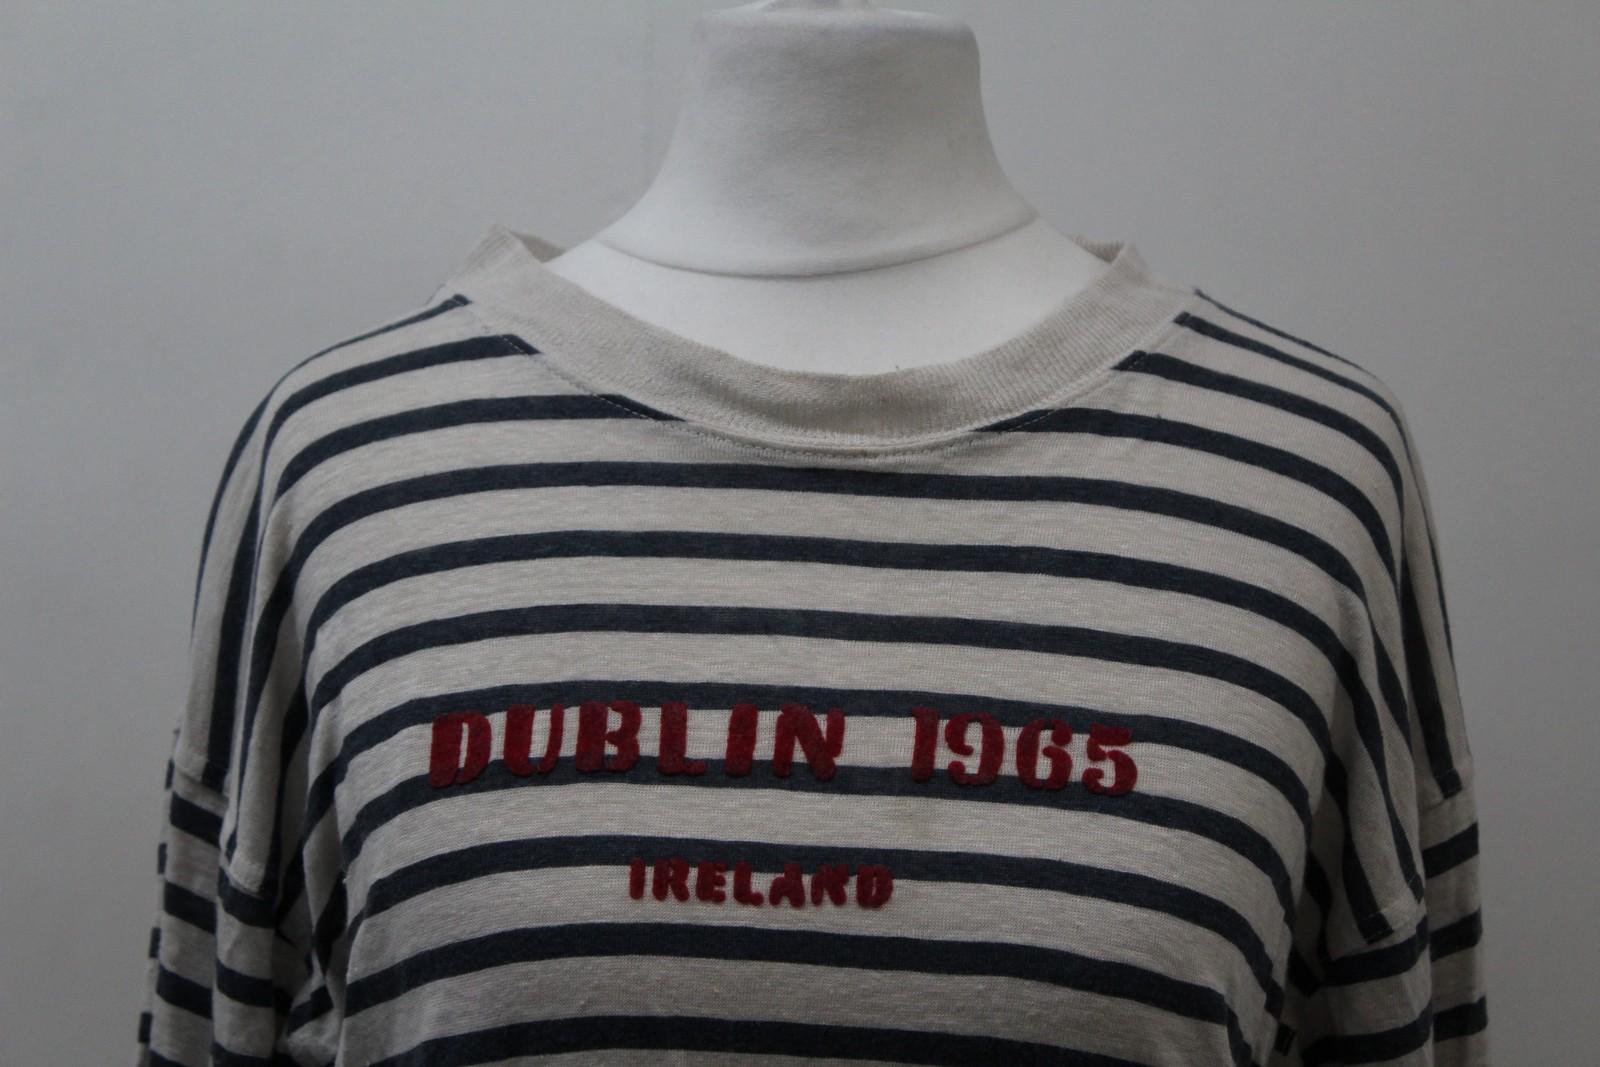 ISABEL-MARANT-ETOILE-Damas-Marfil-Lino-Mangas-Largas-Franjas-Dublin-1965-Top-S miniatura 3